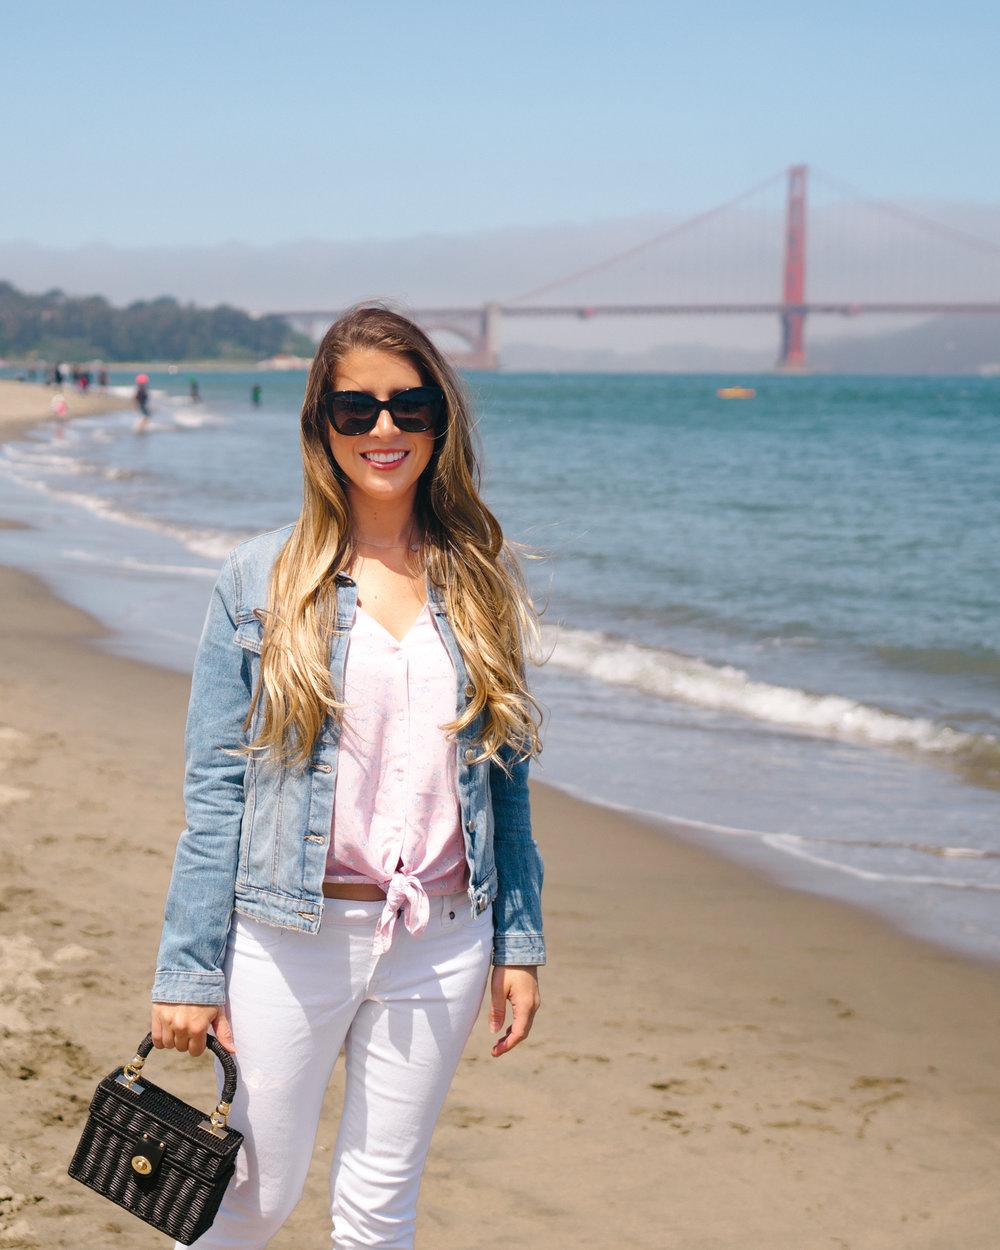 San Francisco Travel Guide